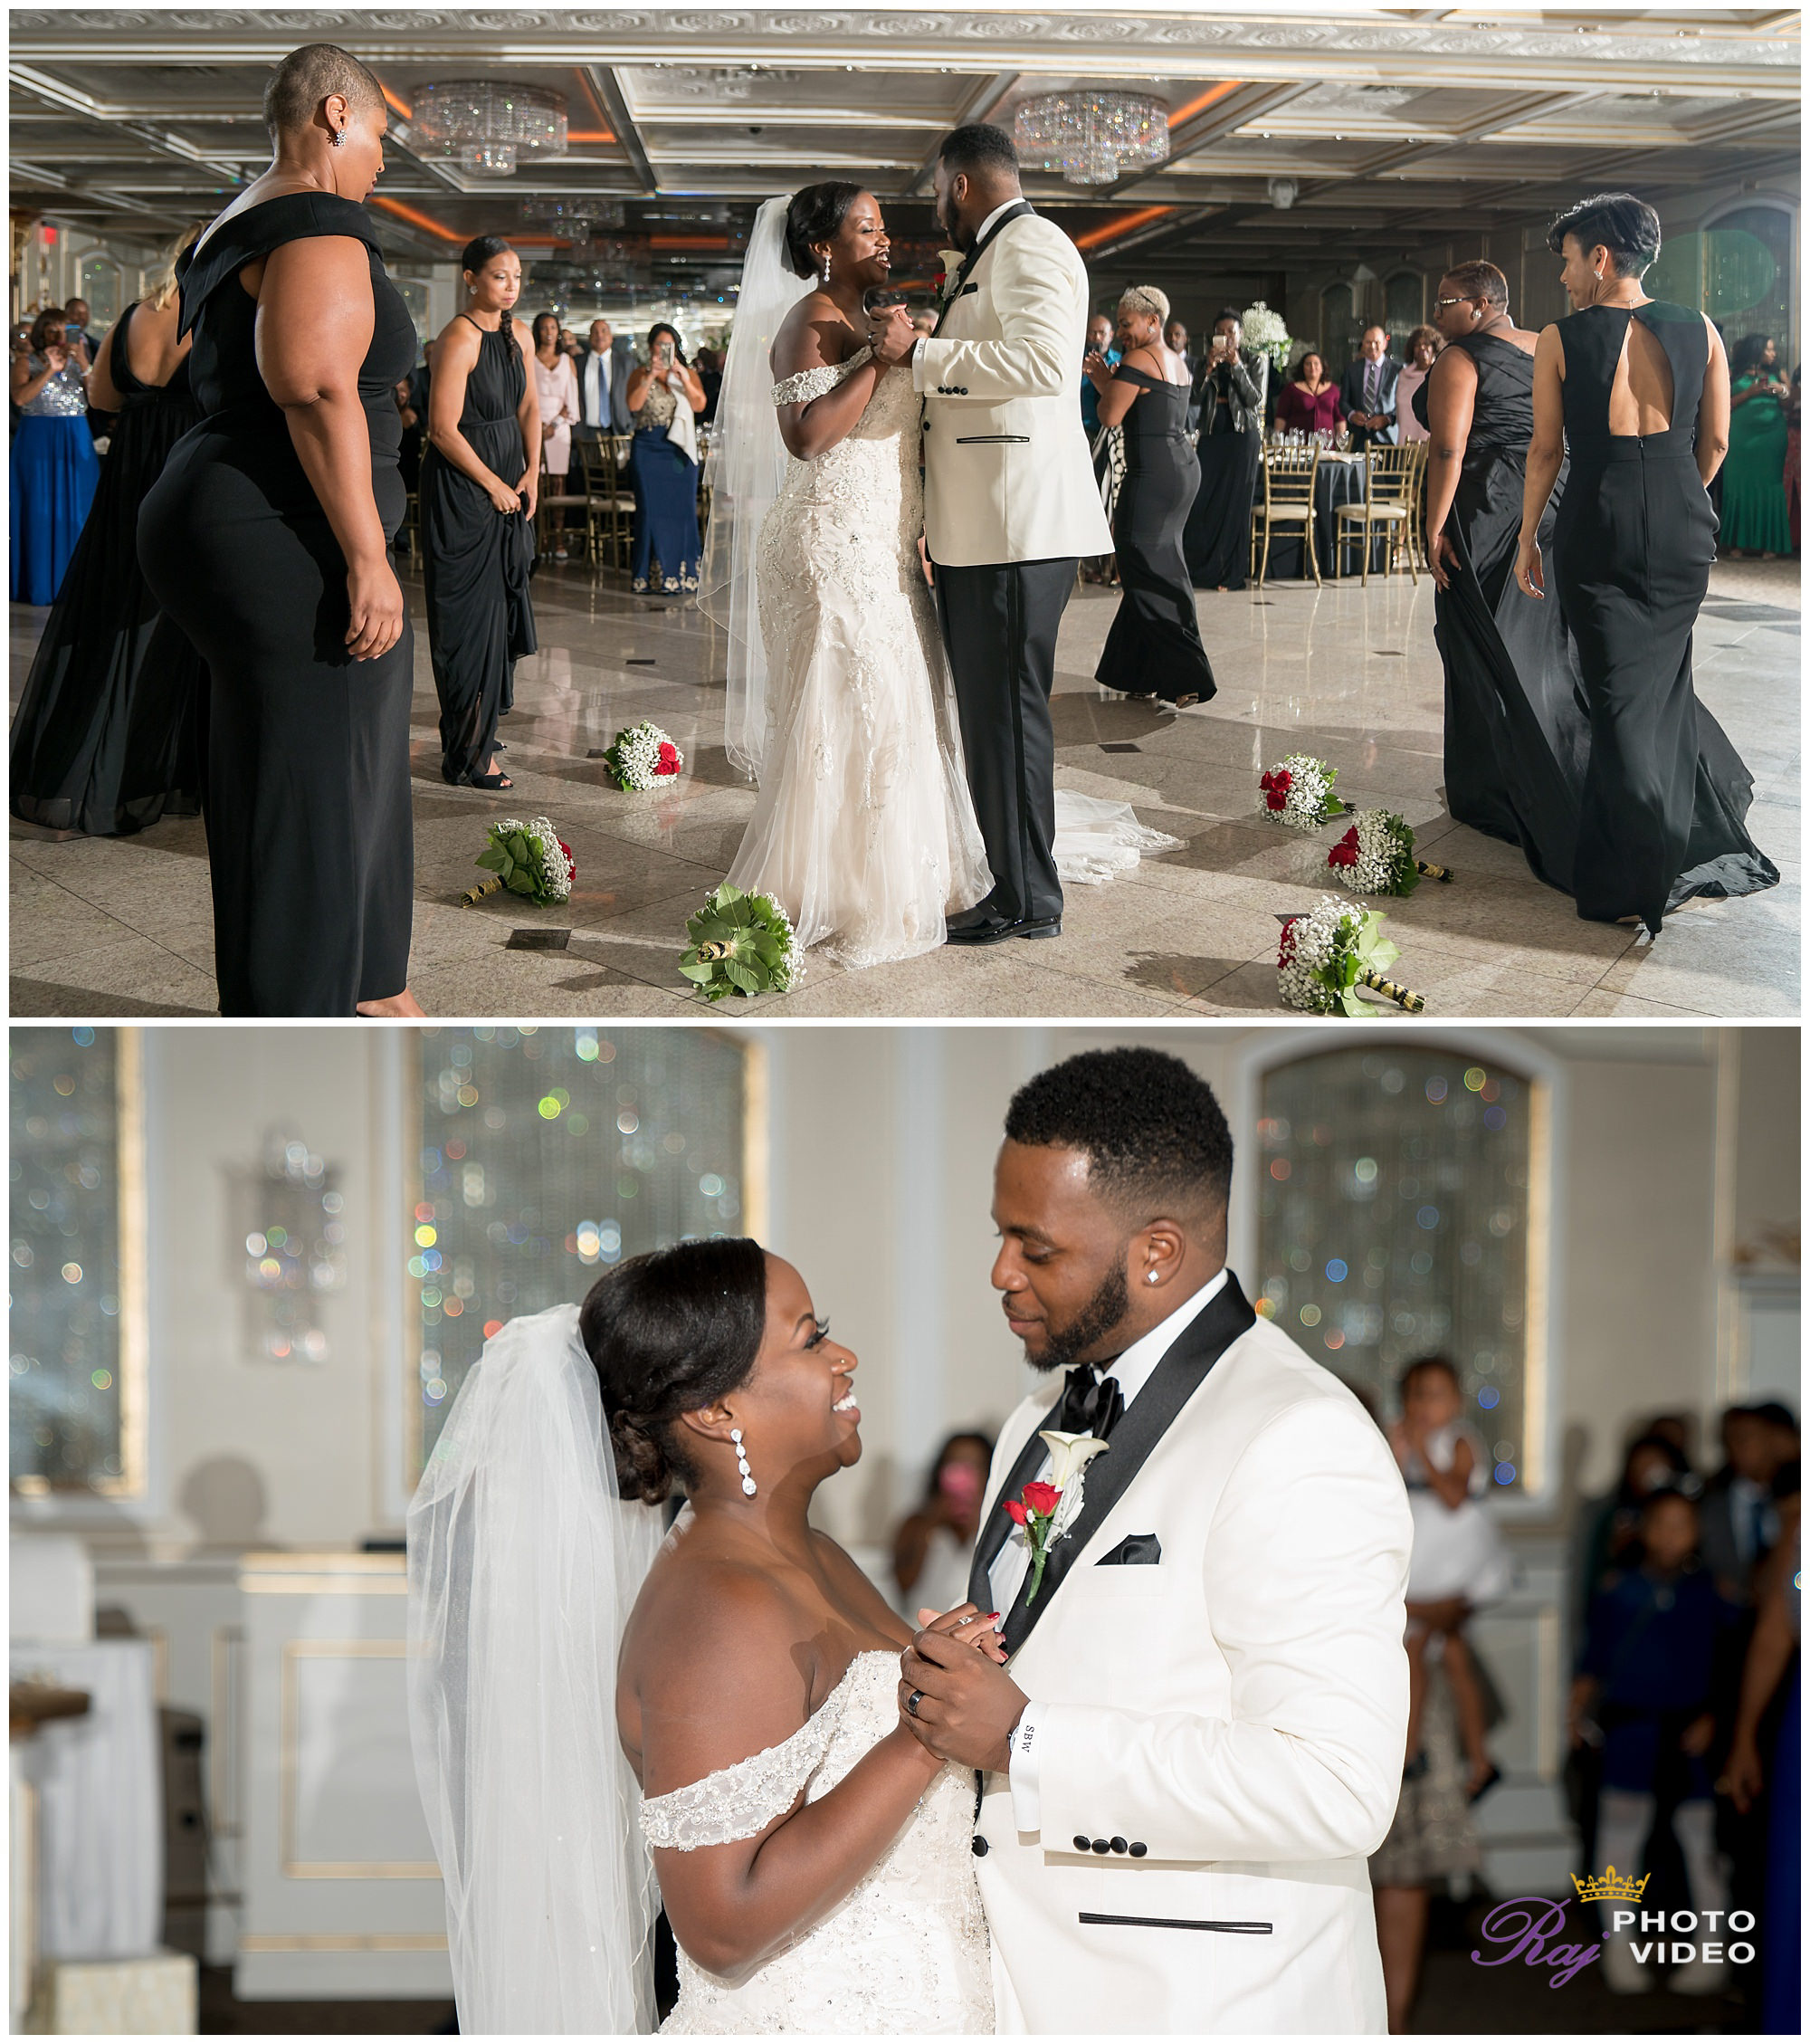 Royal_Manor_Garfield_NJ_Christian_Wedding_Jade_Scott-0021.jpg